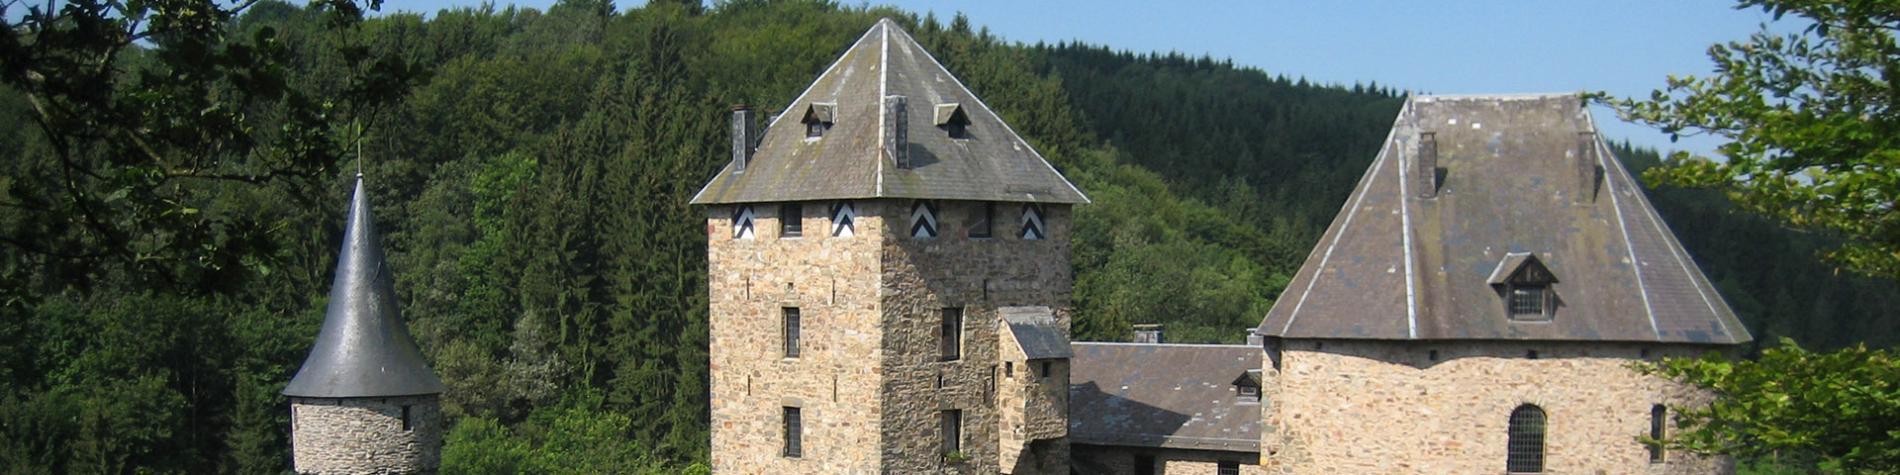 Château - Reinhardstein - Canton de l'Est - Wallonie insolite